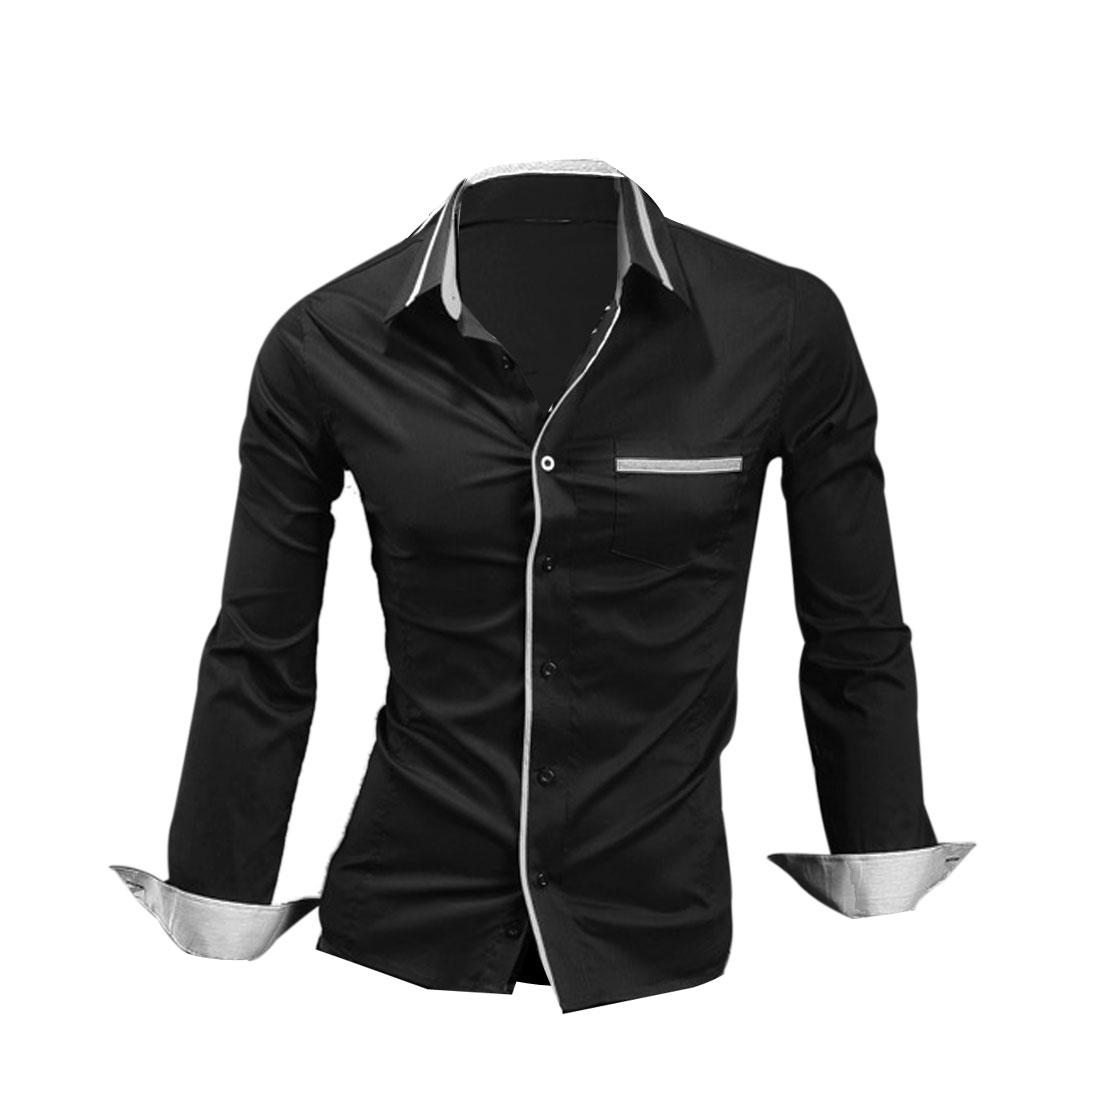 Men Button Up Long Sleeve Pocket Front Shirt Black M